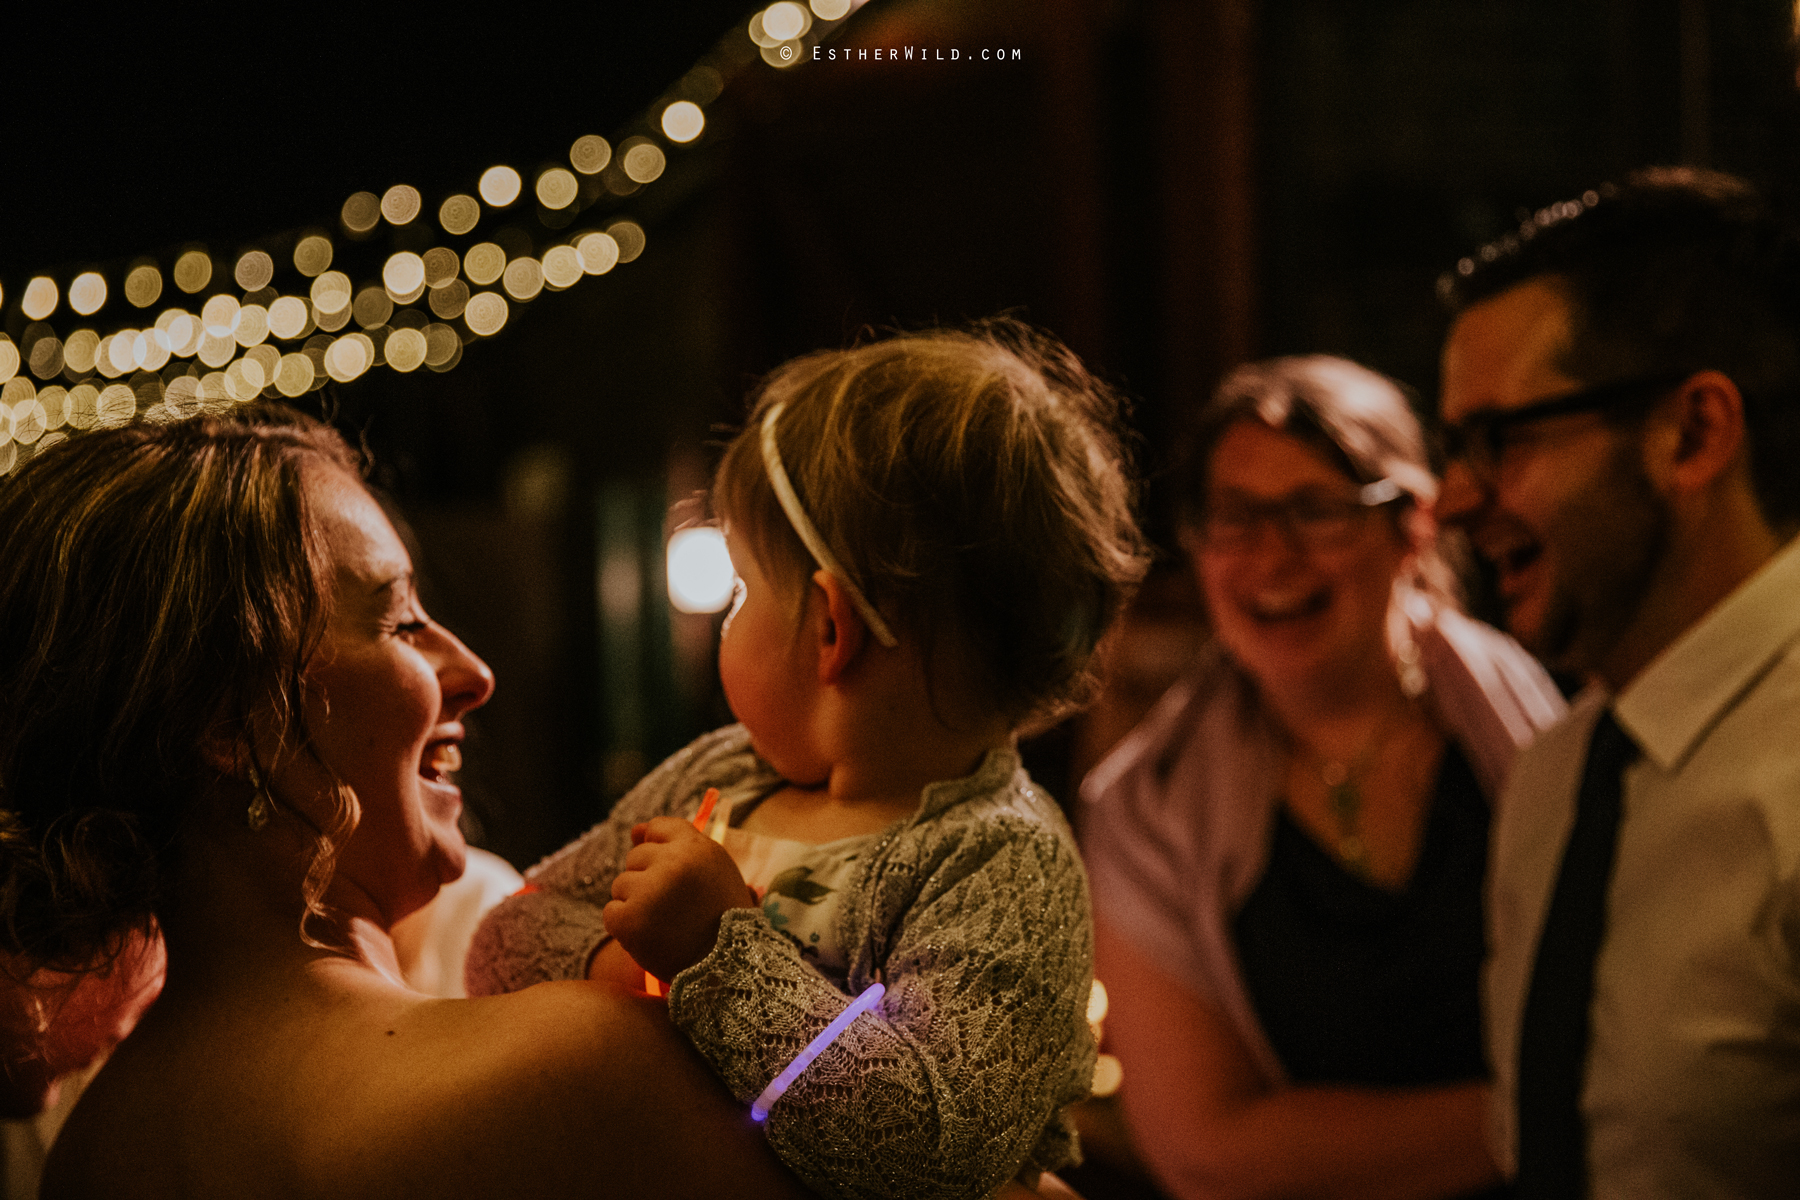 Glebe_Farm_Barn_Rustic_Norfolk_Wedding_Esther_Wild_Photographer_Copyright_IMG_3343.jpg